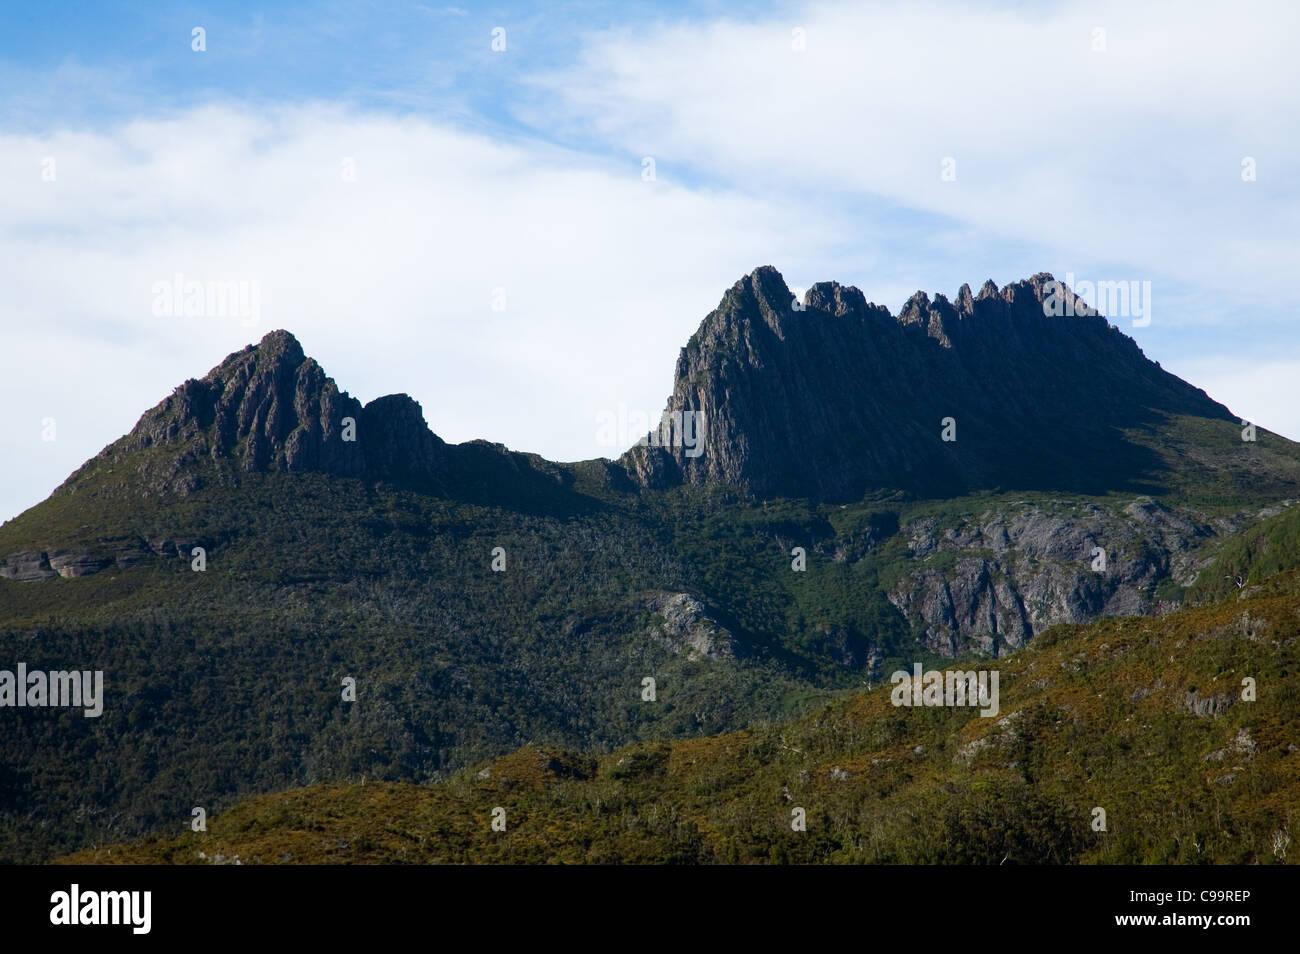 Cradle Mountain in Tasmania's central highlands.  Cradle Mountain-Lake St Clair National Park, Tasmania, Australia - Stock Image